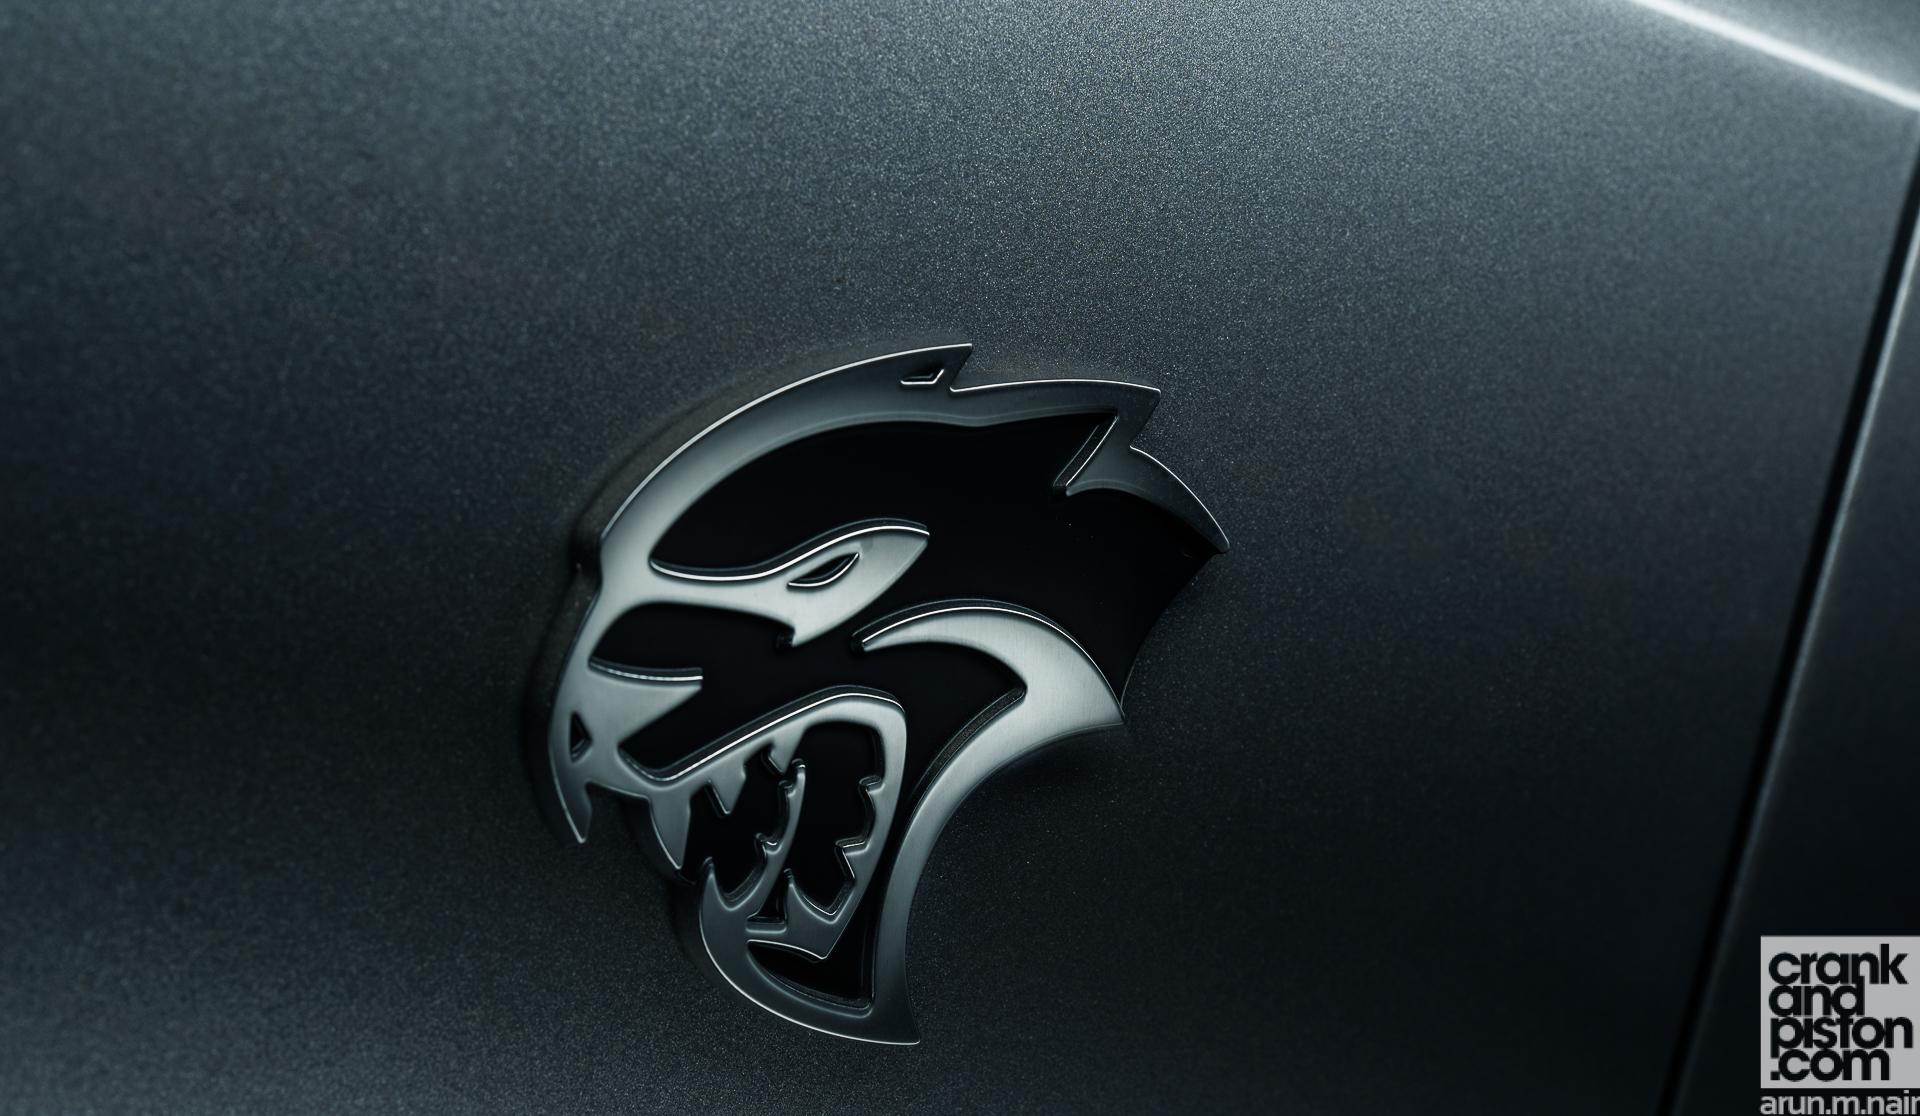 17 Charger Hellcat >> Dodge Challenger SRT Hellcat. Set 1 - crankandpiston.com